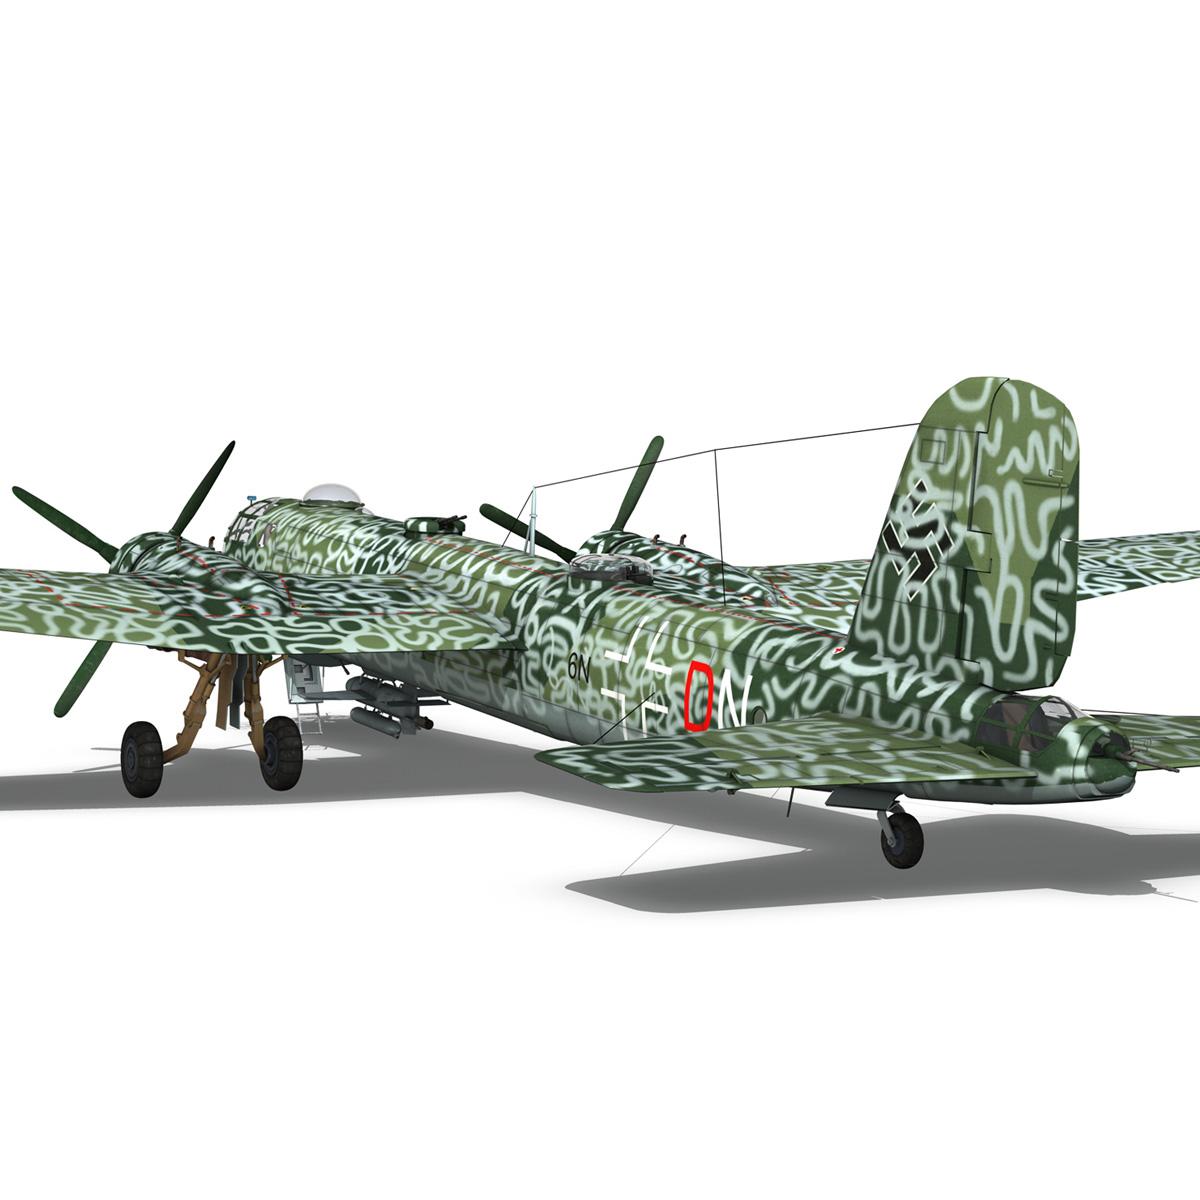 heinkel he-177 a-5 – greif – 6ndn 3d model 3ds fbx c4d lwo obj 201595